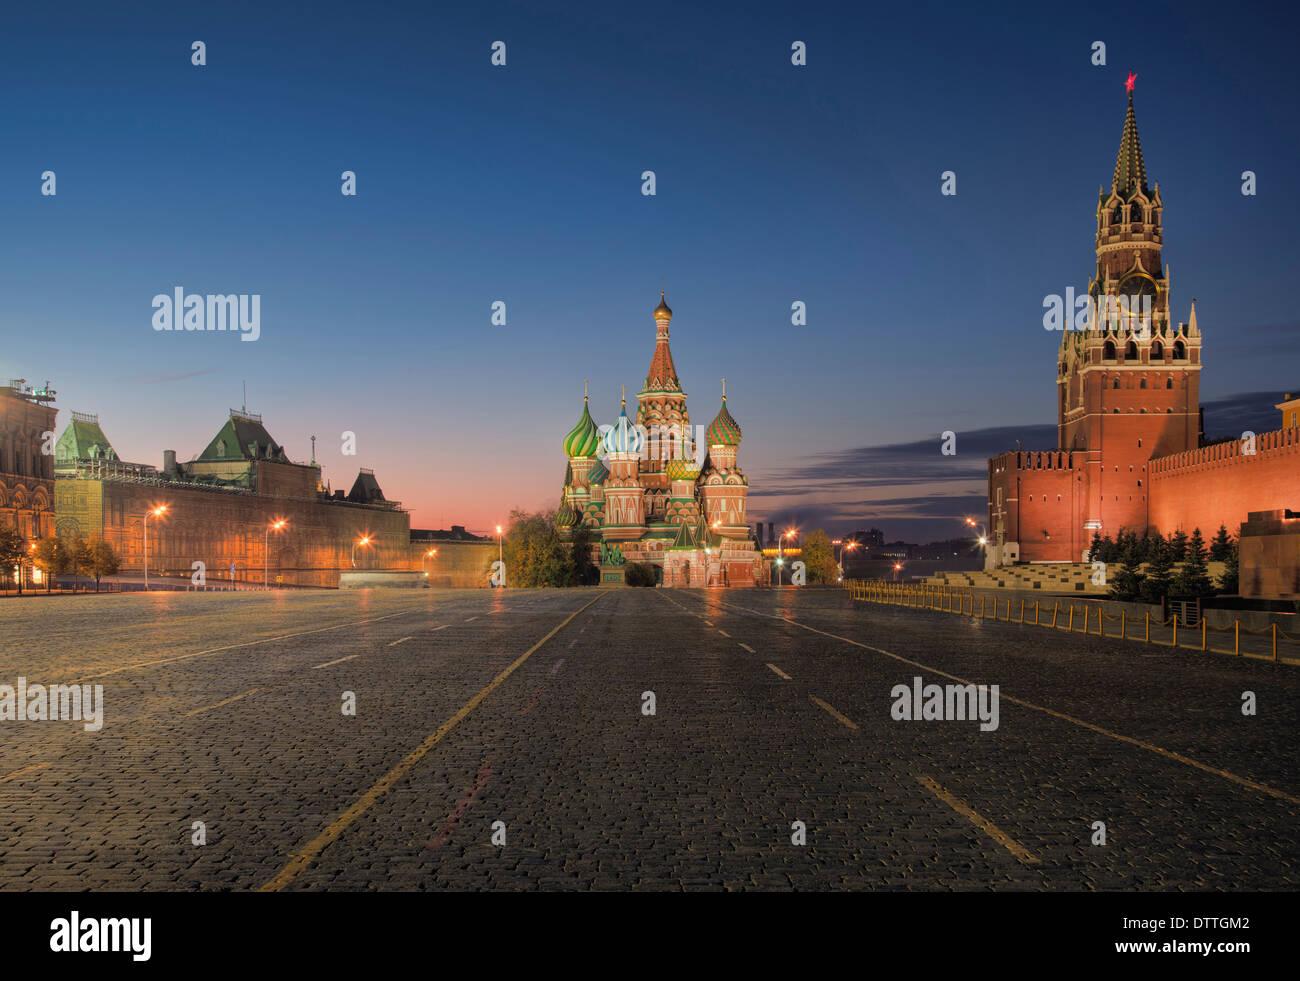 Kreml, Basilius Kathedrale und Roter Platz, Moskau, Russland Stockbild